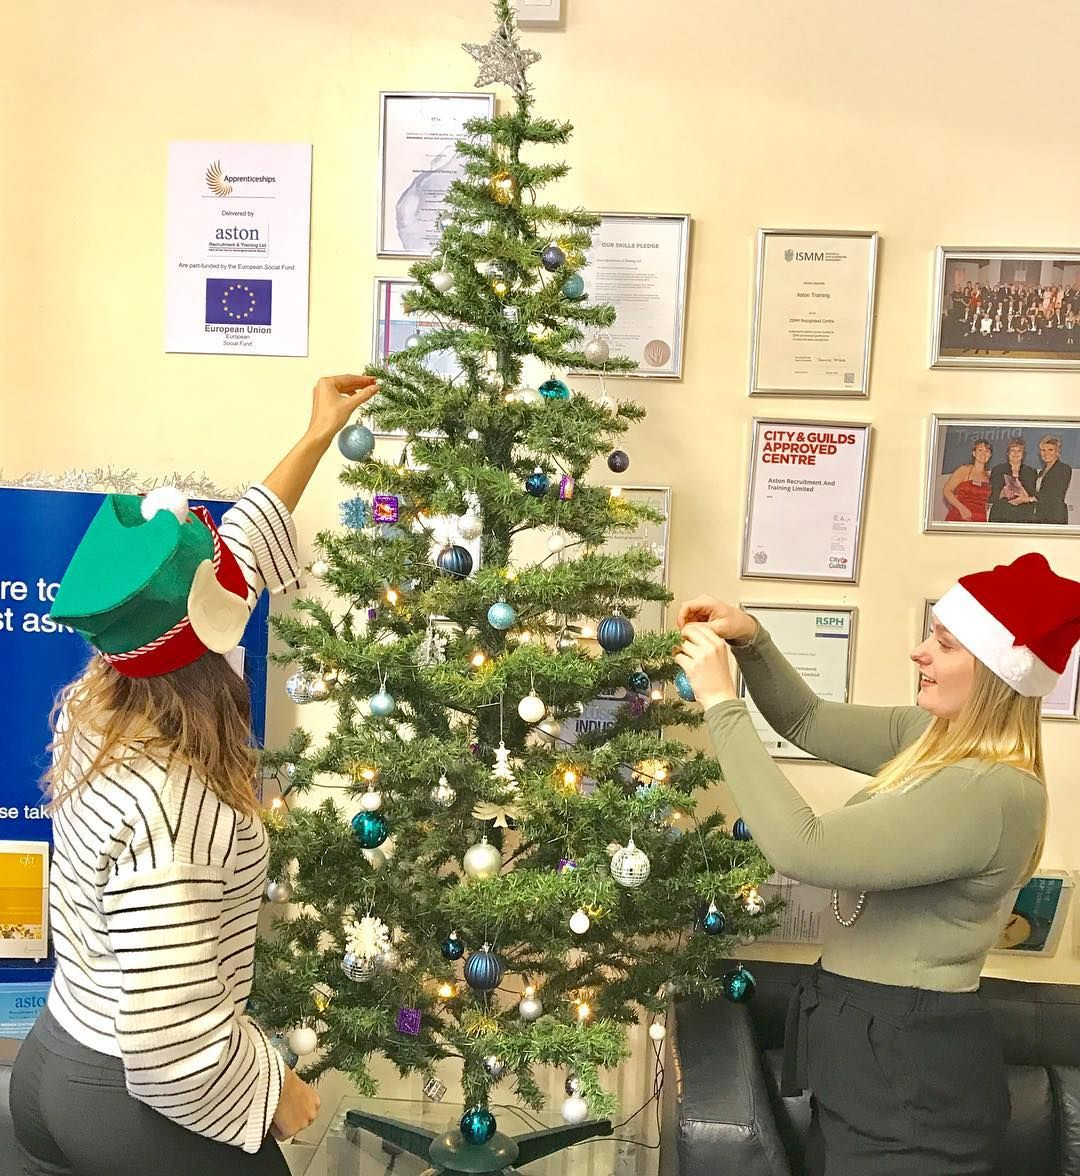 christmas tree sassy christmas tree decoration ideas - Office Christmas Tree Decorating Ideas